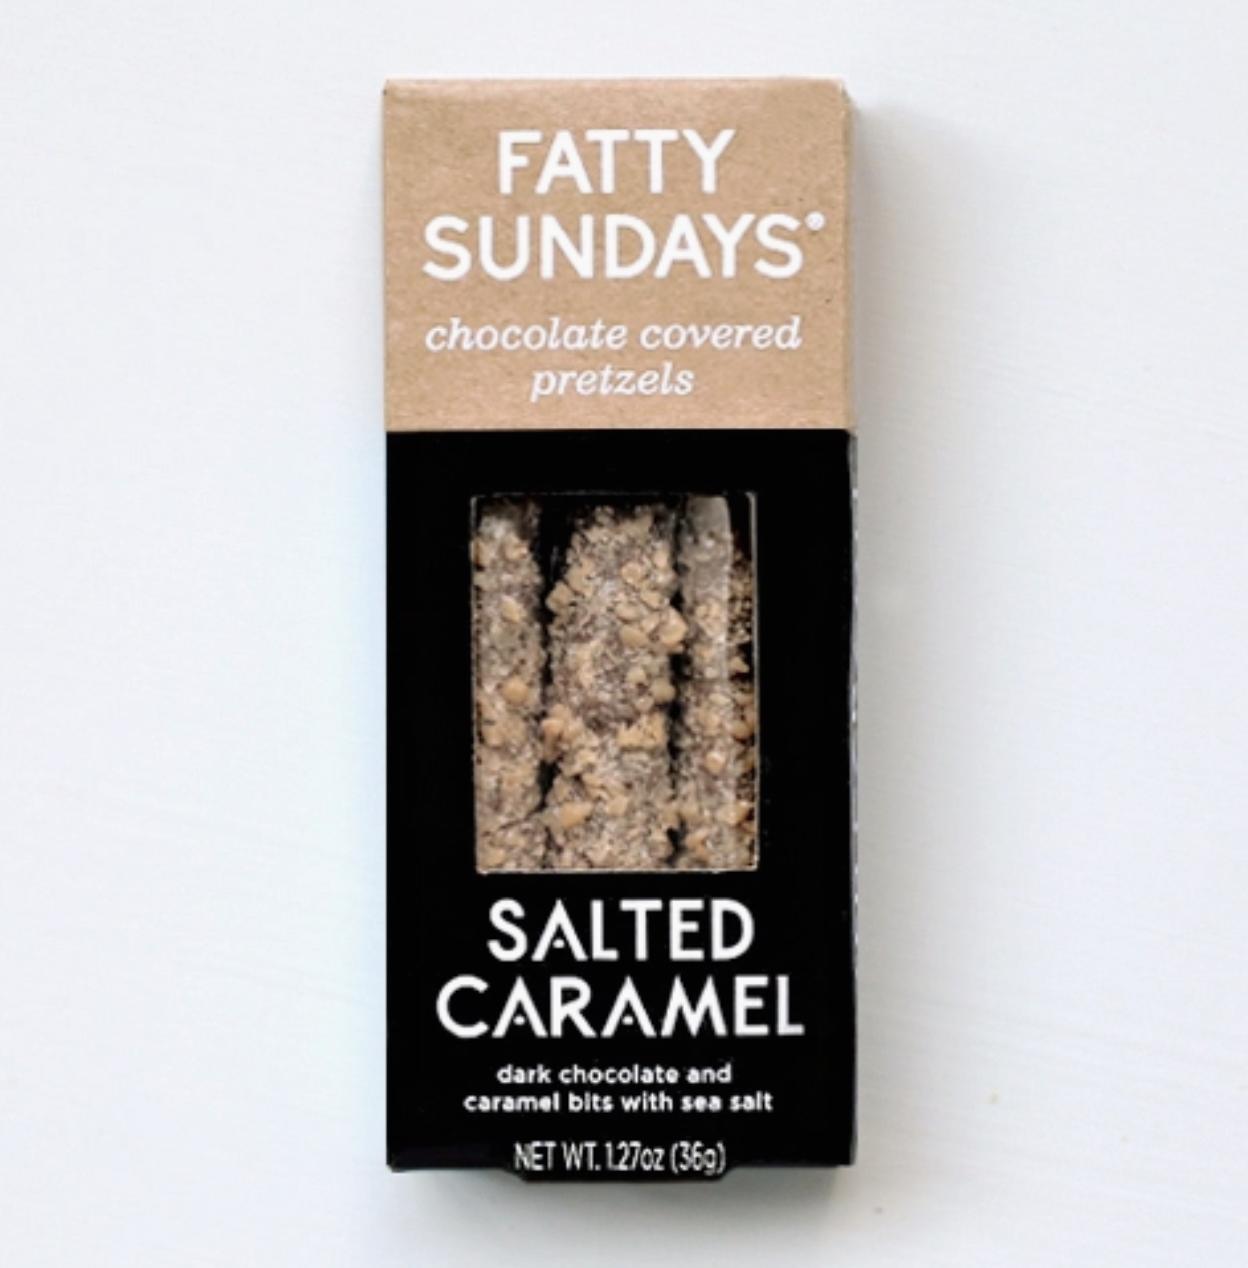 Fatty Sundays Salted Caramel Chocolate Covered Pretzels